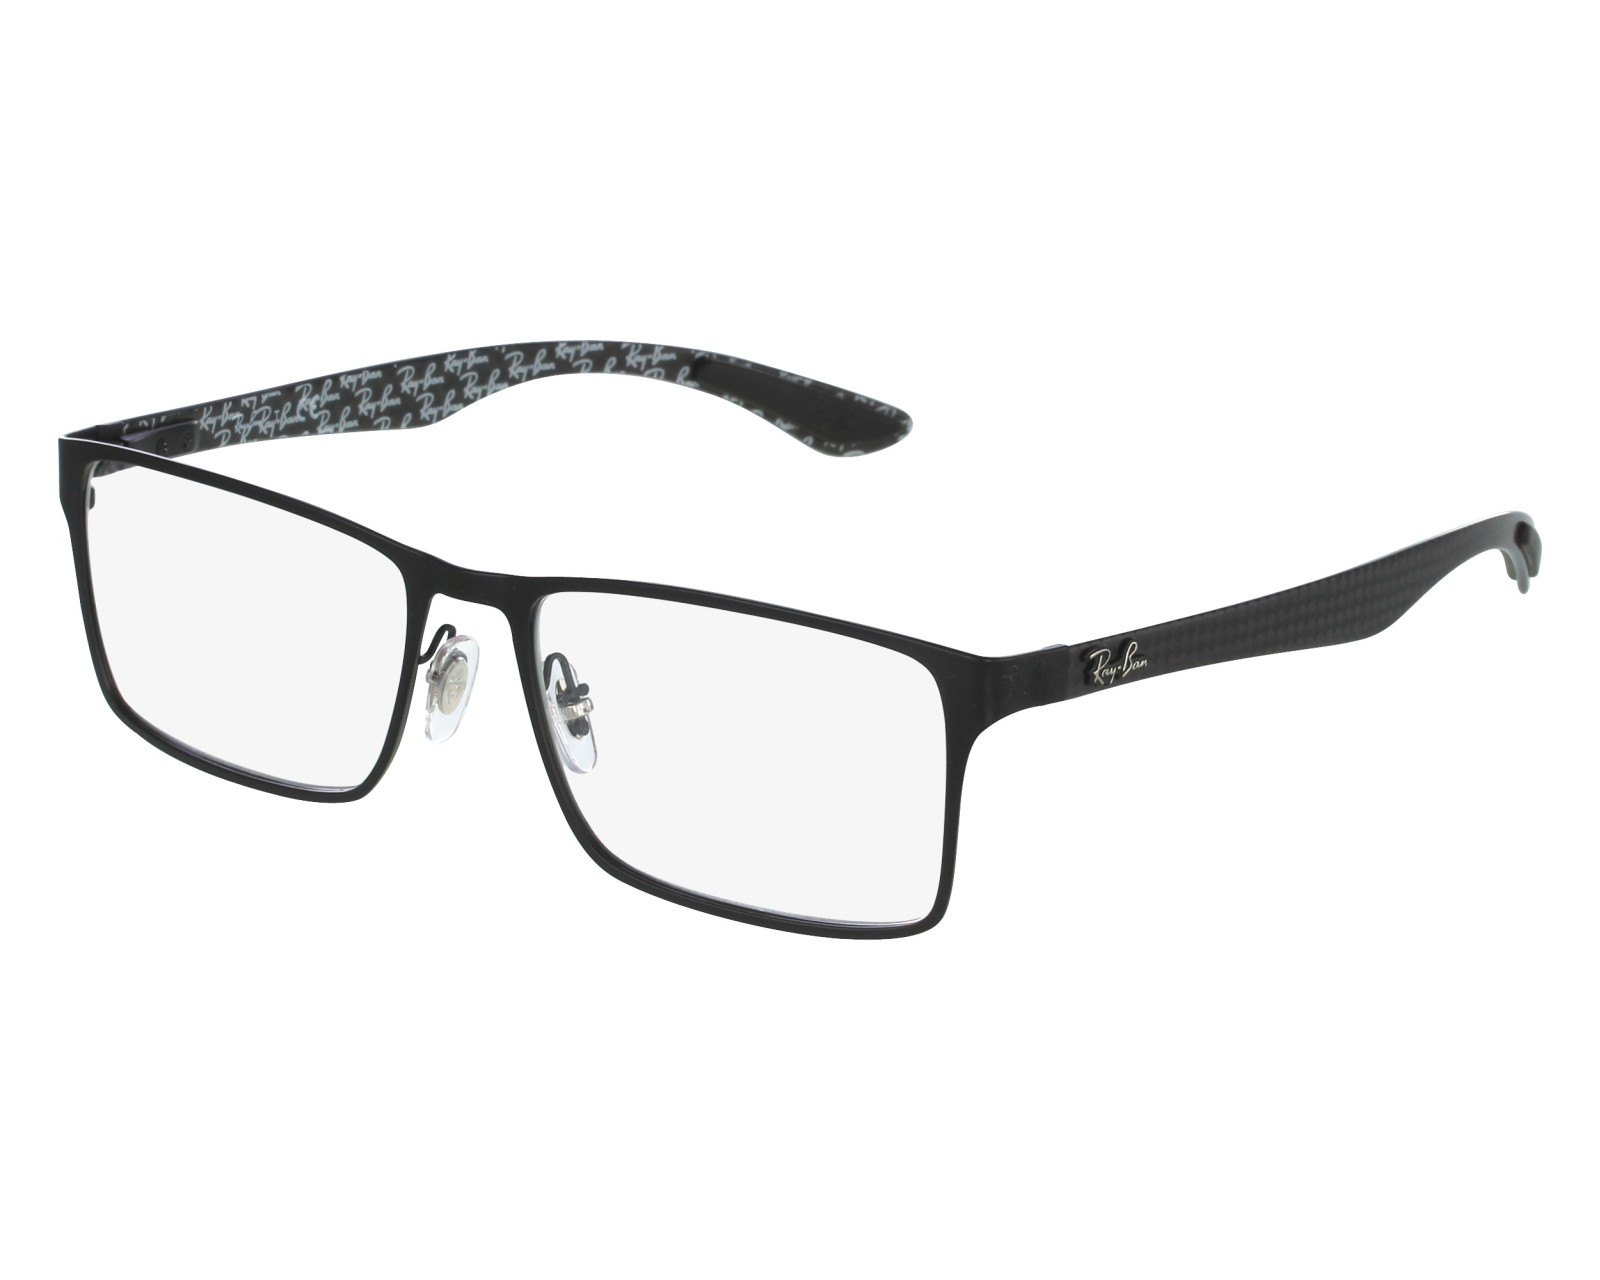 694eaa6d1d Gafas Graduadas Ray-Ban RX-8415 2848 53-17 Negra vista de frente